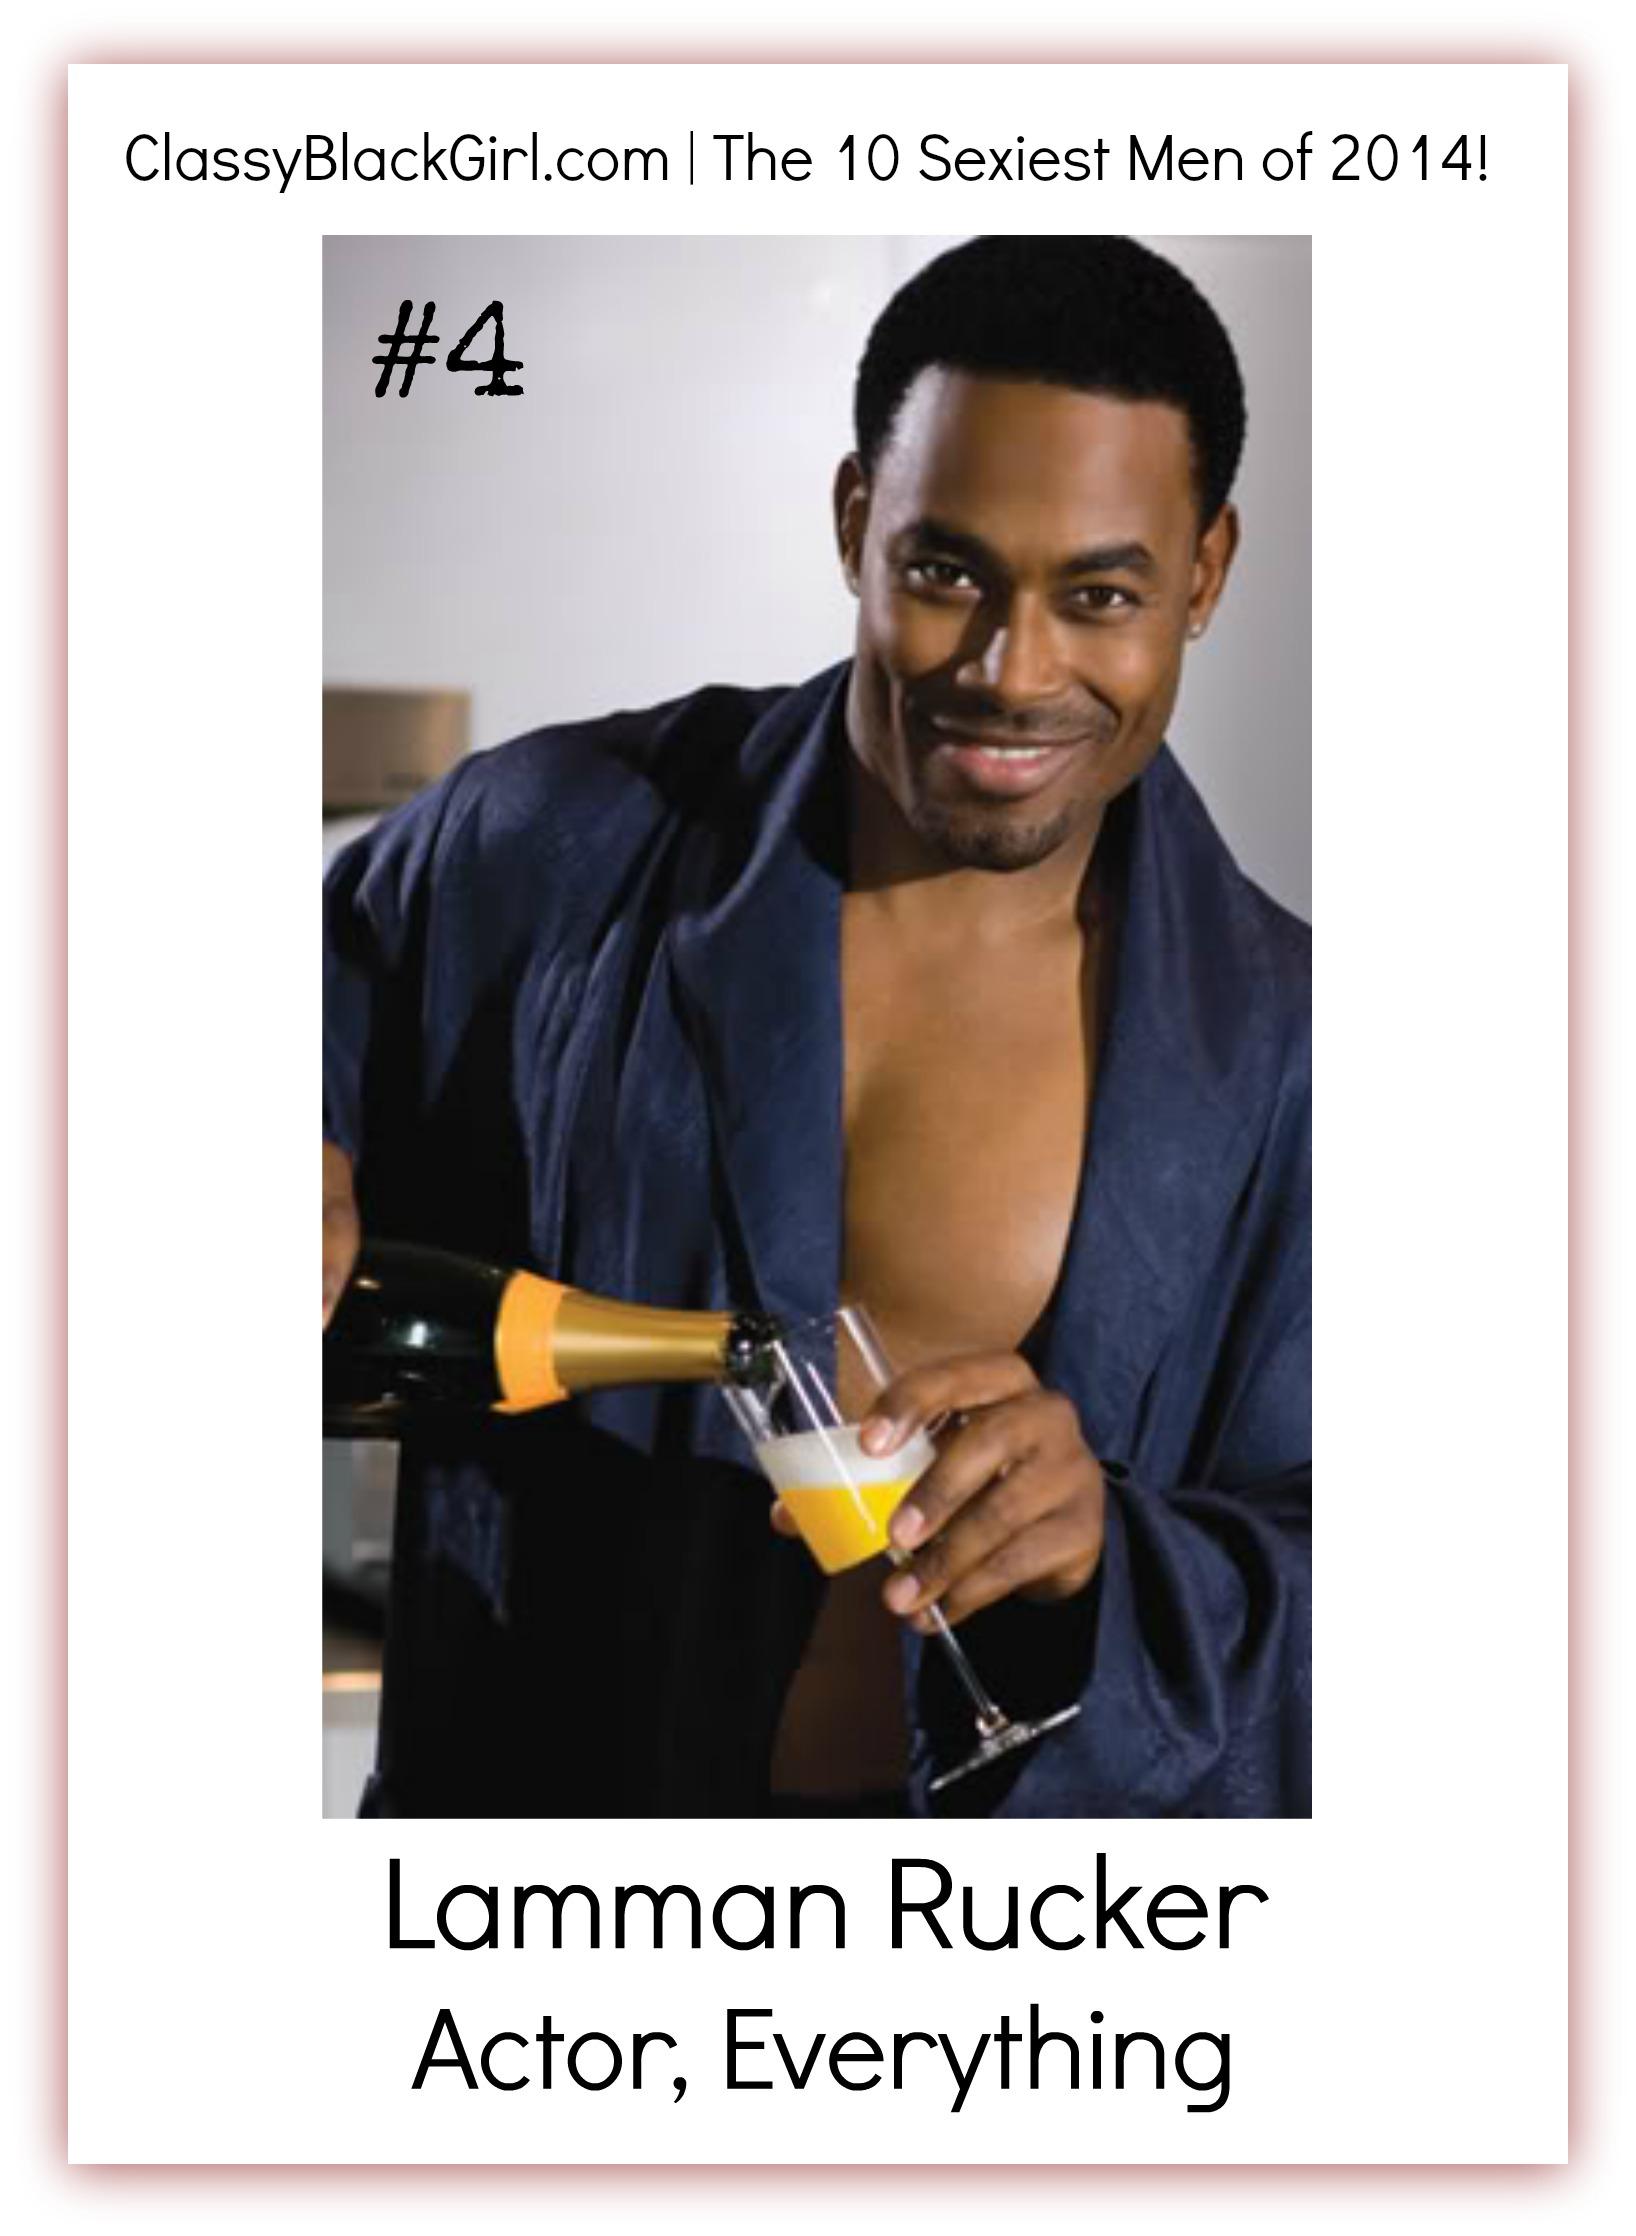 Lamman Rucker 1 Sexiest Men of 2014 Classy Black Girl